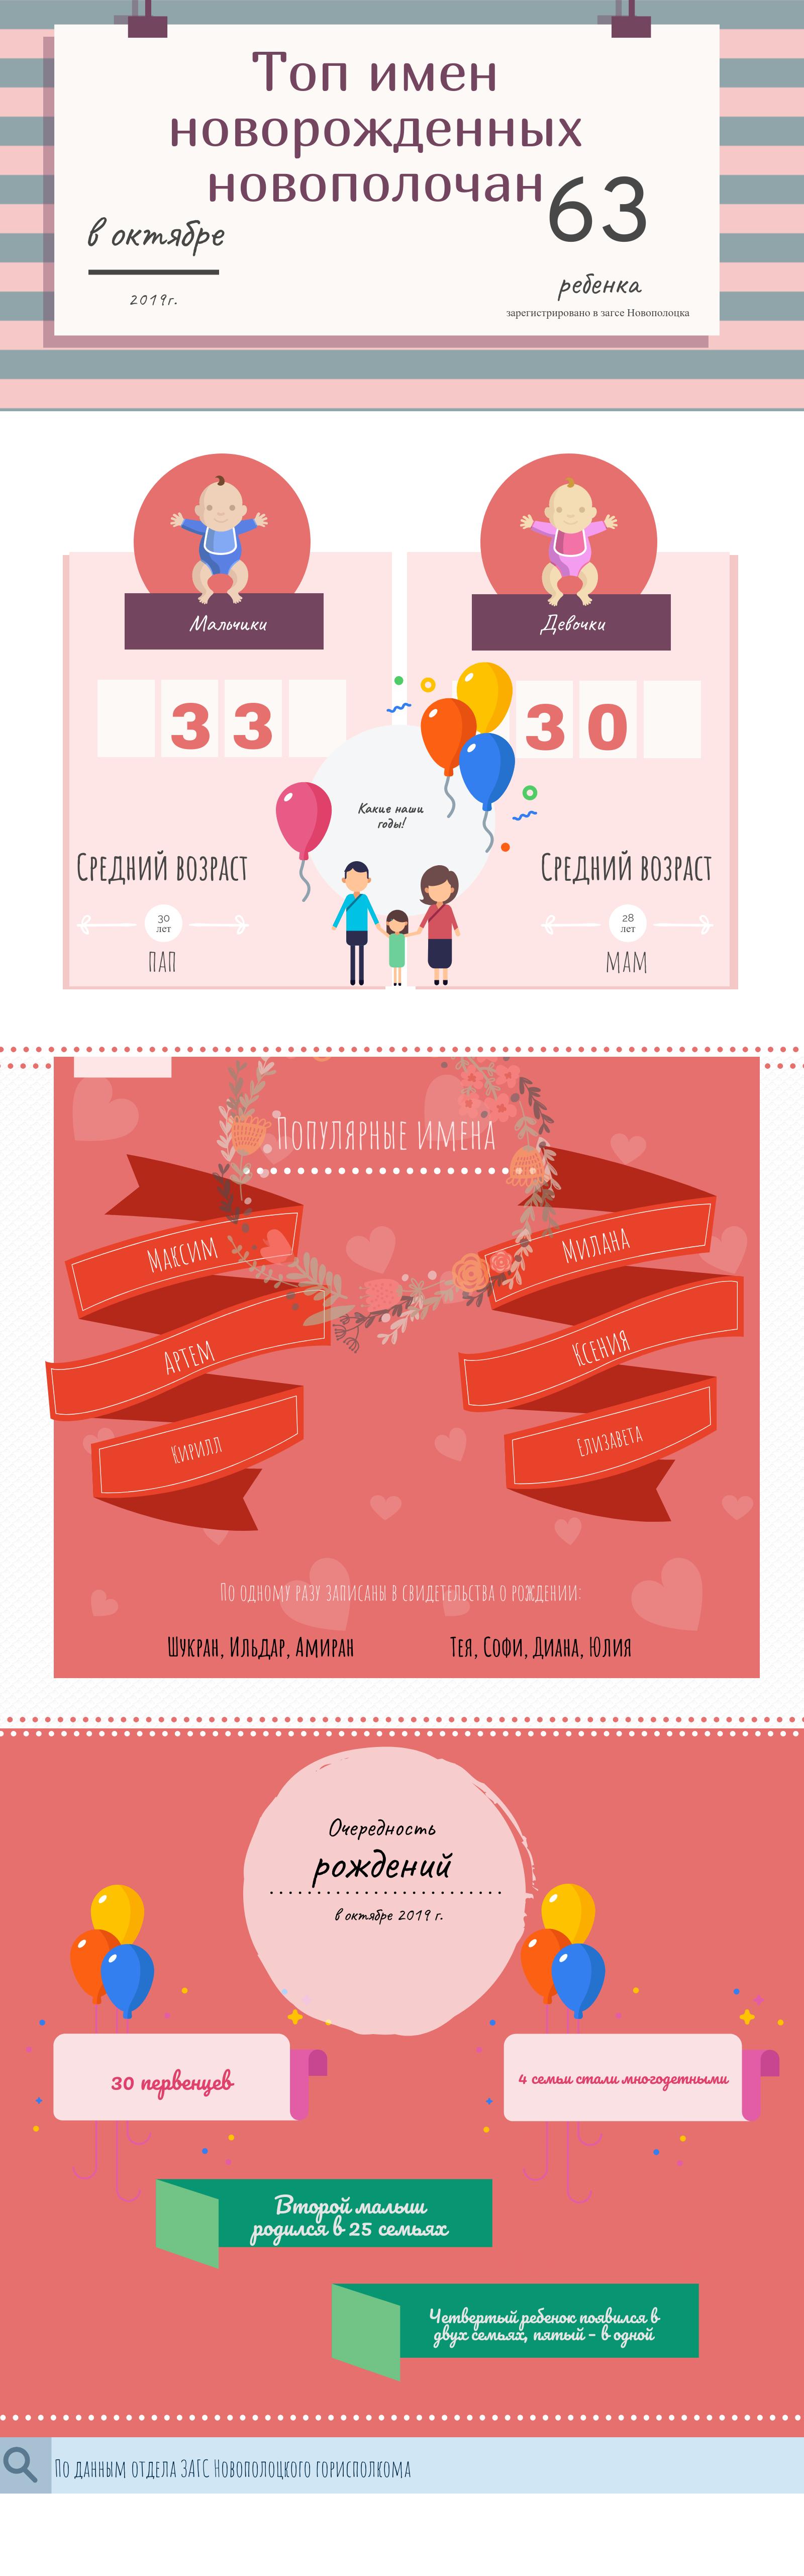 Малыши за октябрь инфографика